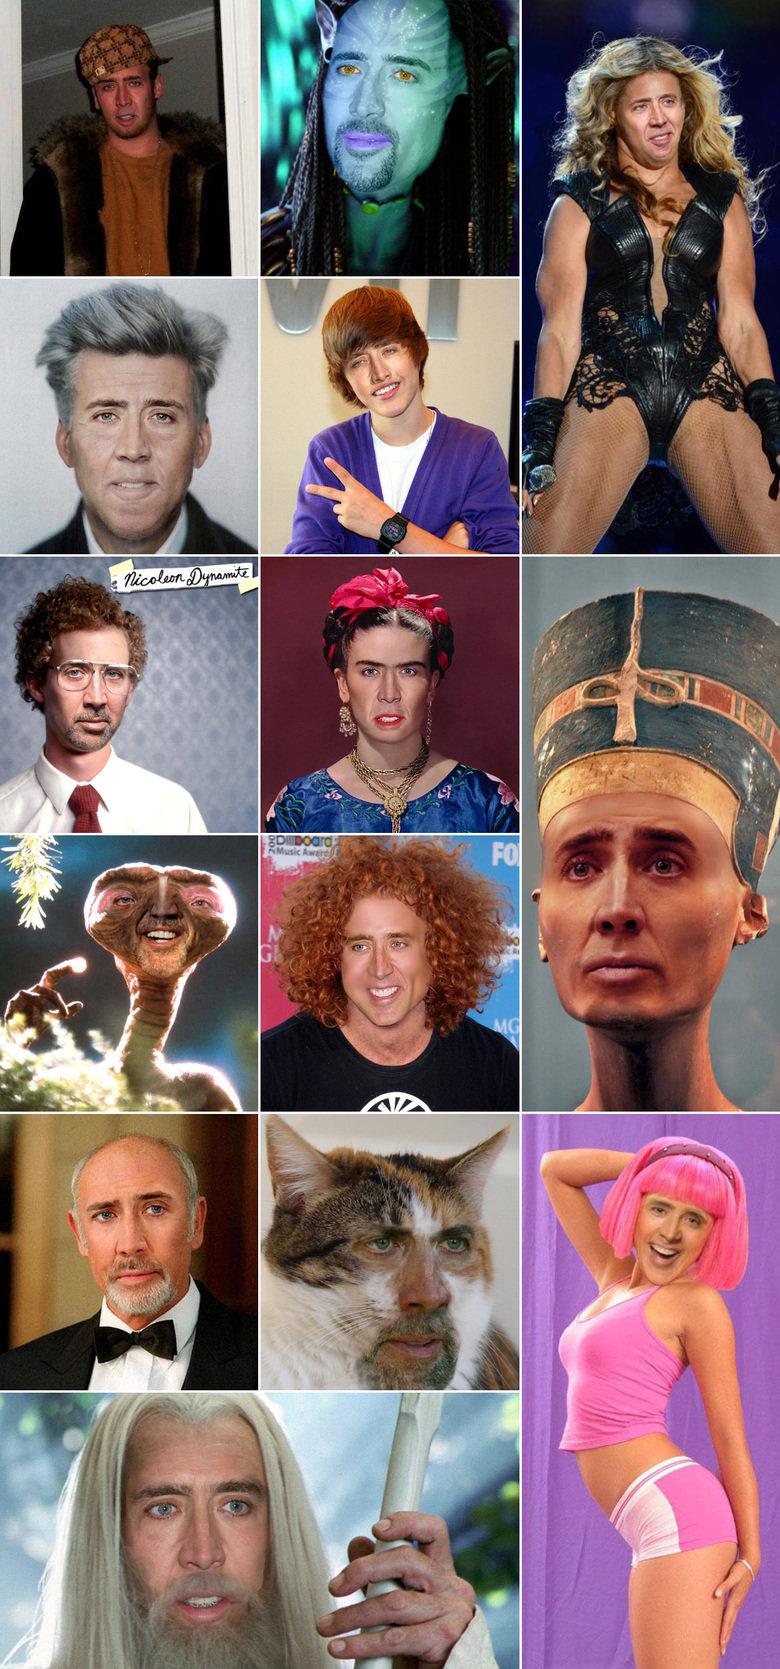 Nicolas Cage as everyone. Source: .. Is that Nicolas Lynch?!